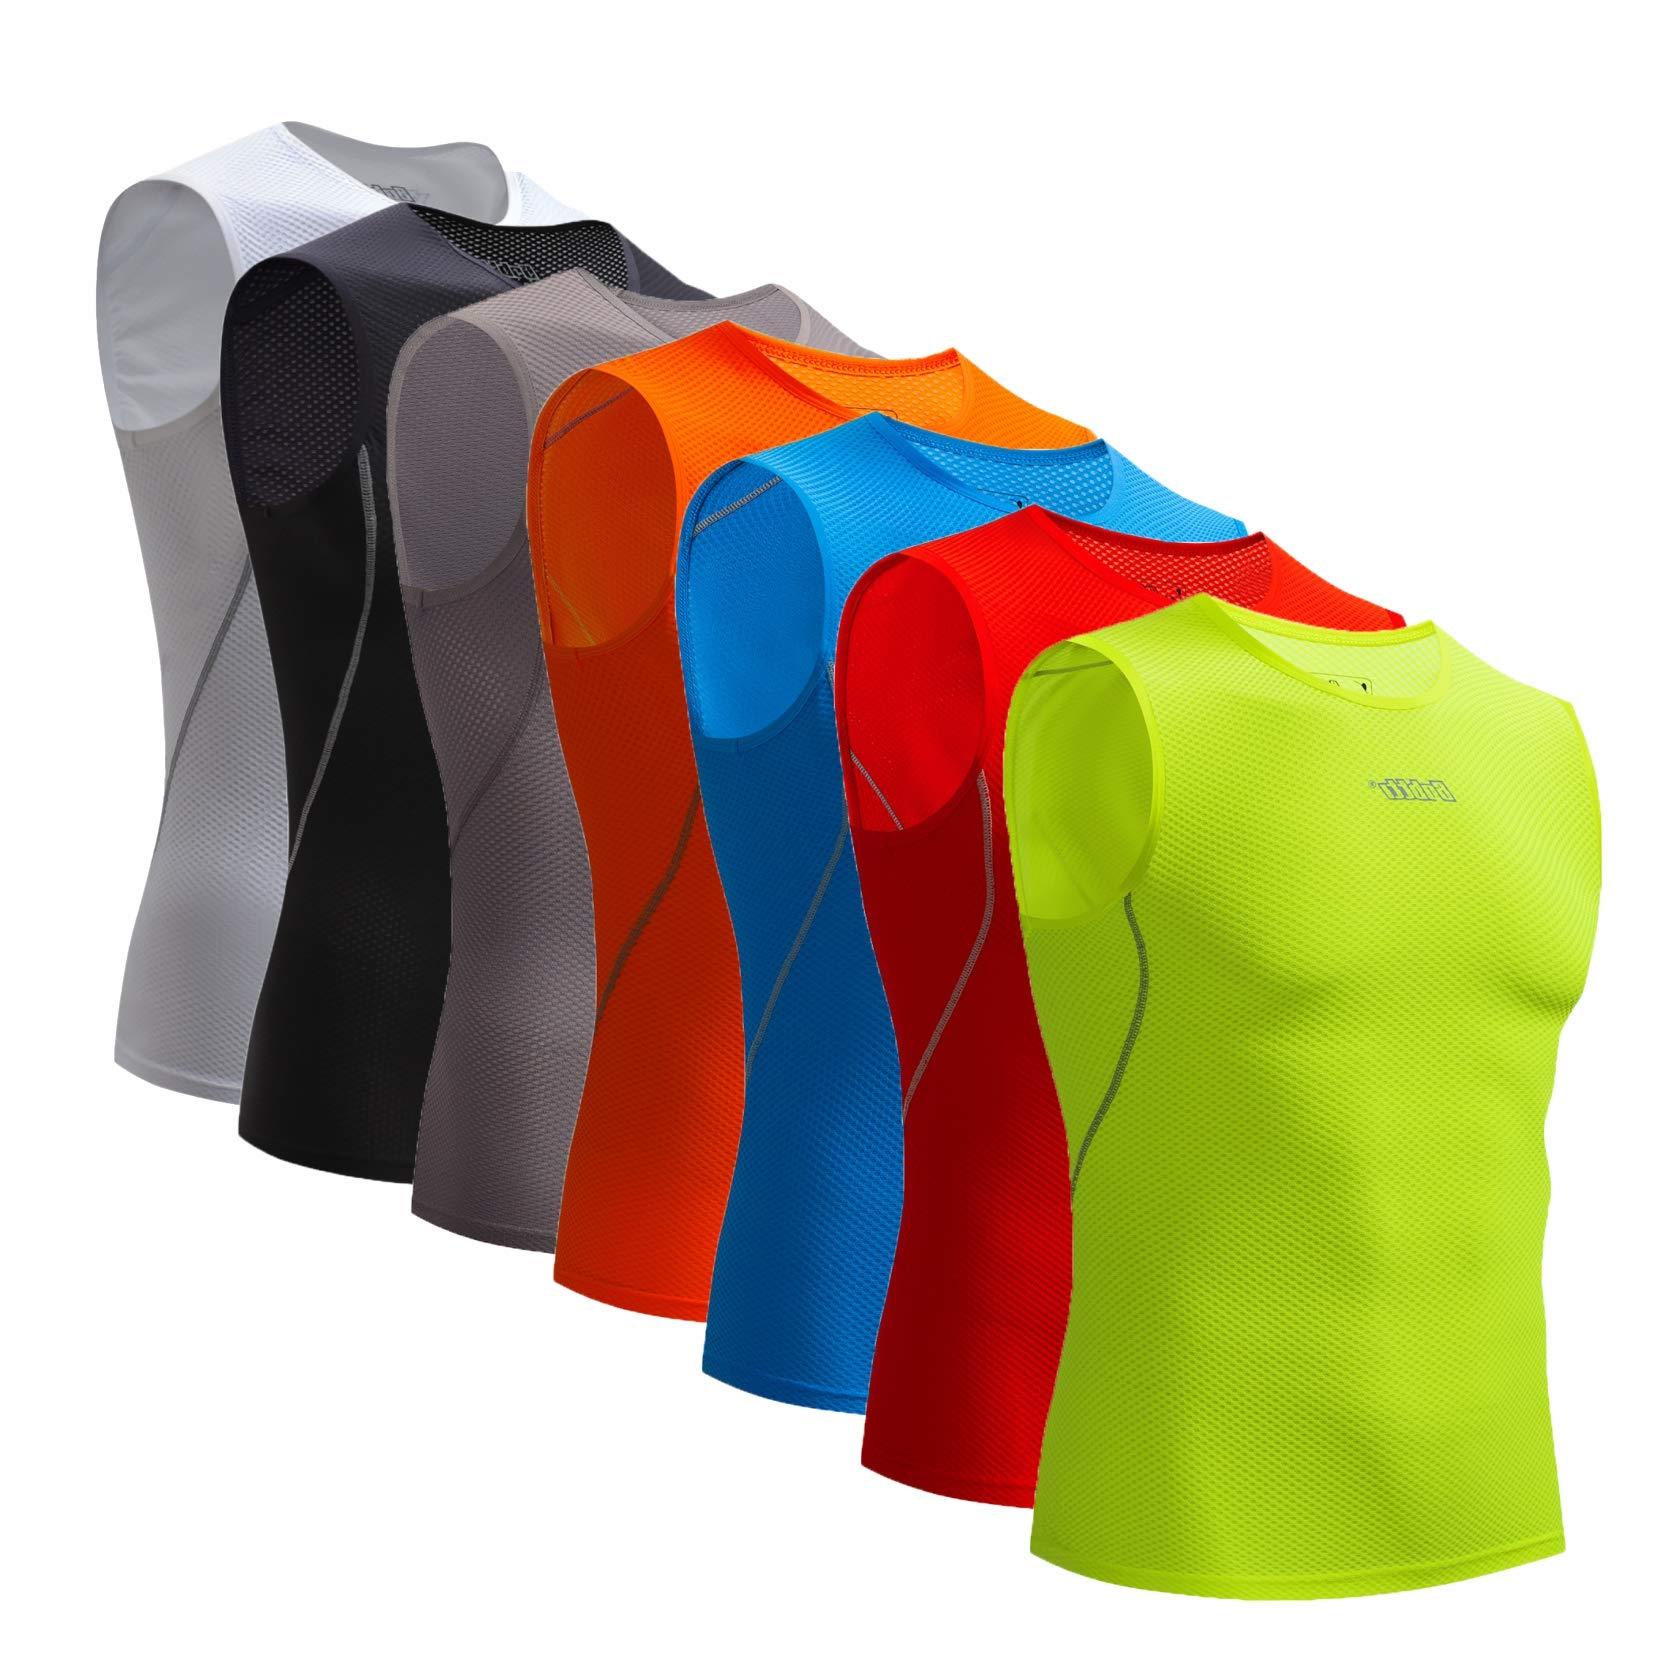 Bpbtti Men's Sleeveless Cycling Base Layer Bike Undershirt,Breathable,Superlight and Moisture Wicking (1 Pack Hi-Viz Yellow, Small)